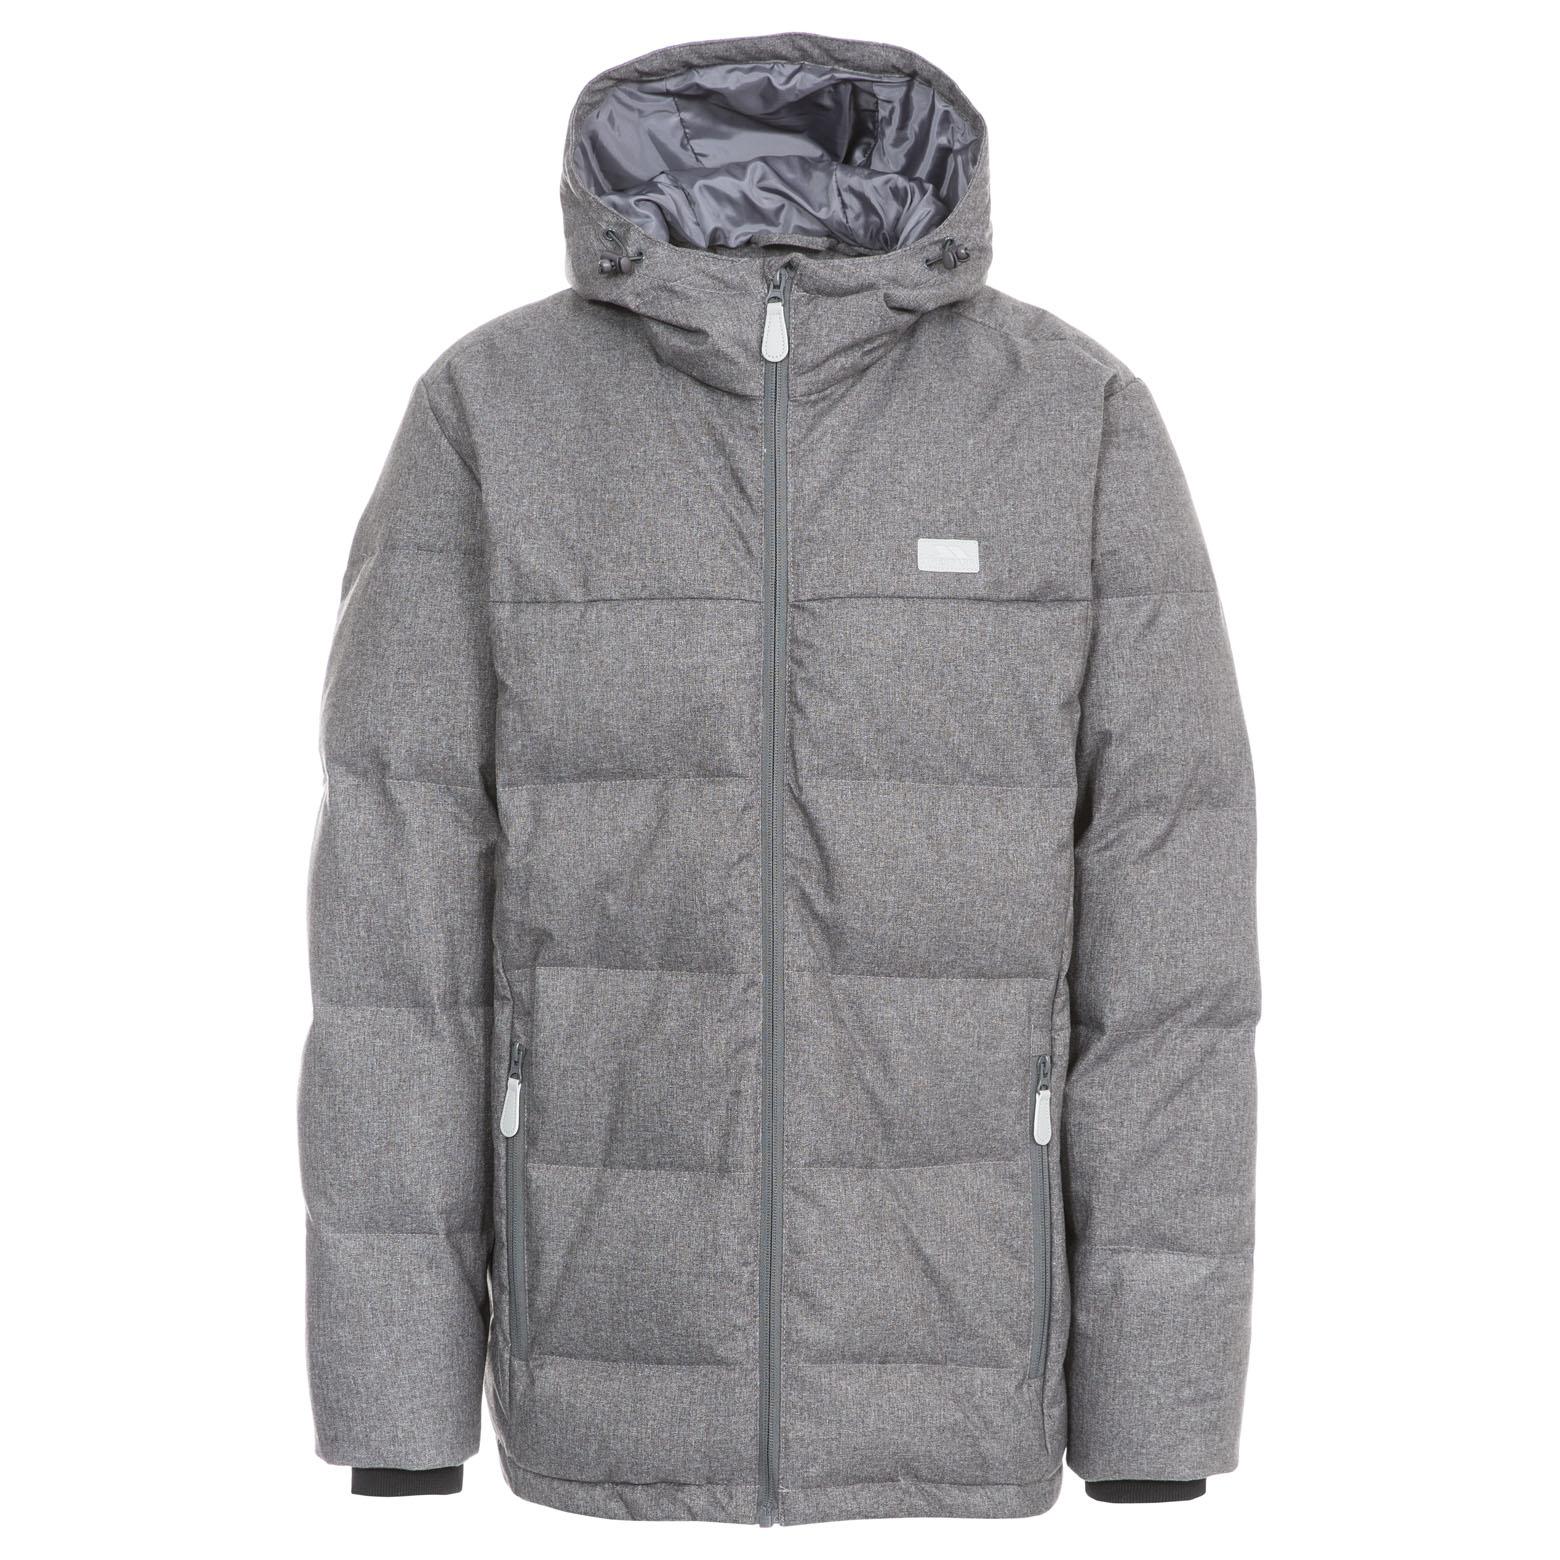 Trespass Sadler Mens Winter Down Jacket Hooded Warm Padded Coat | eBay